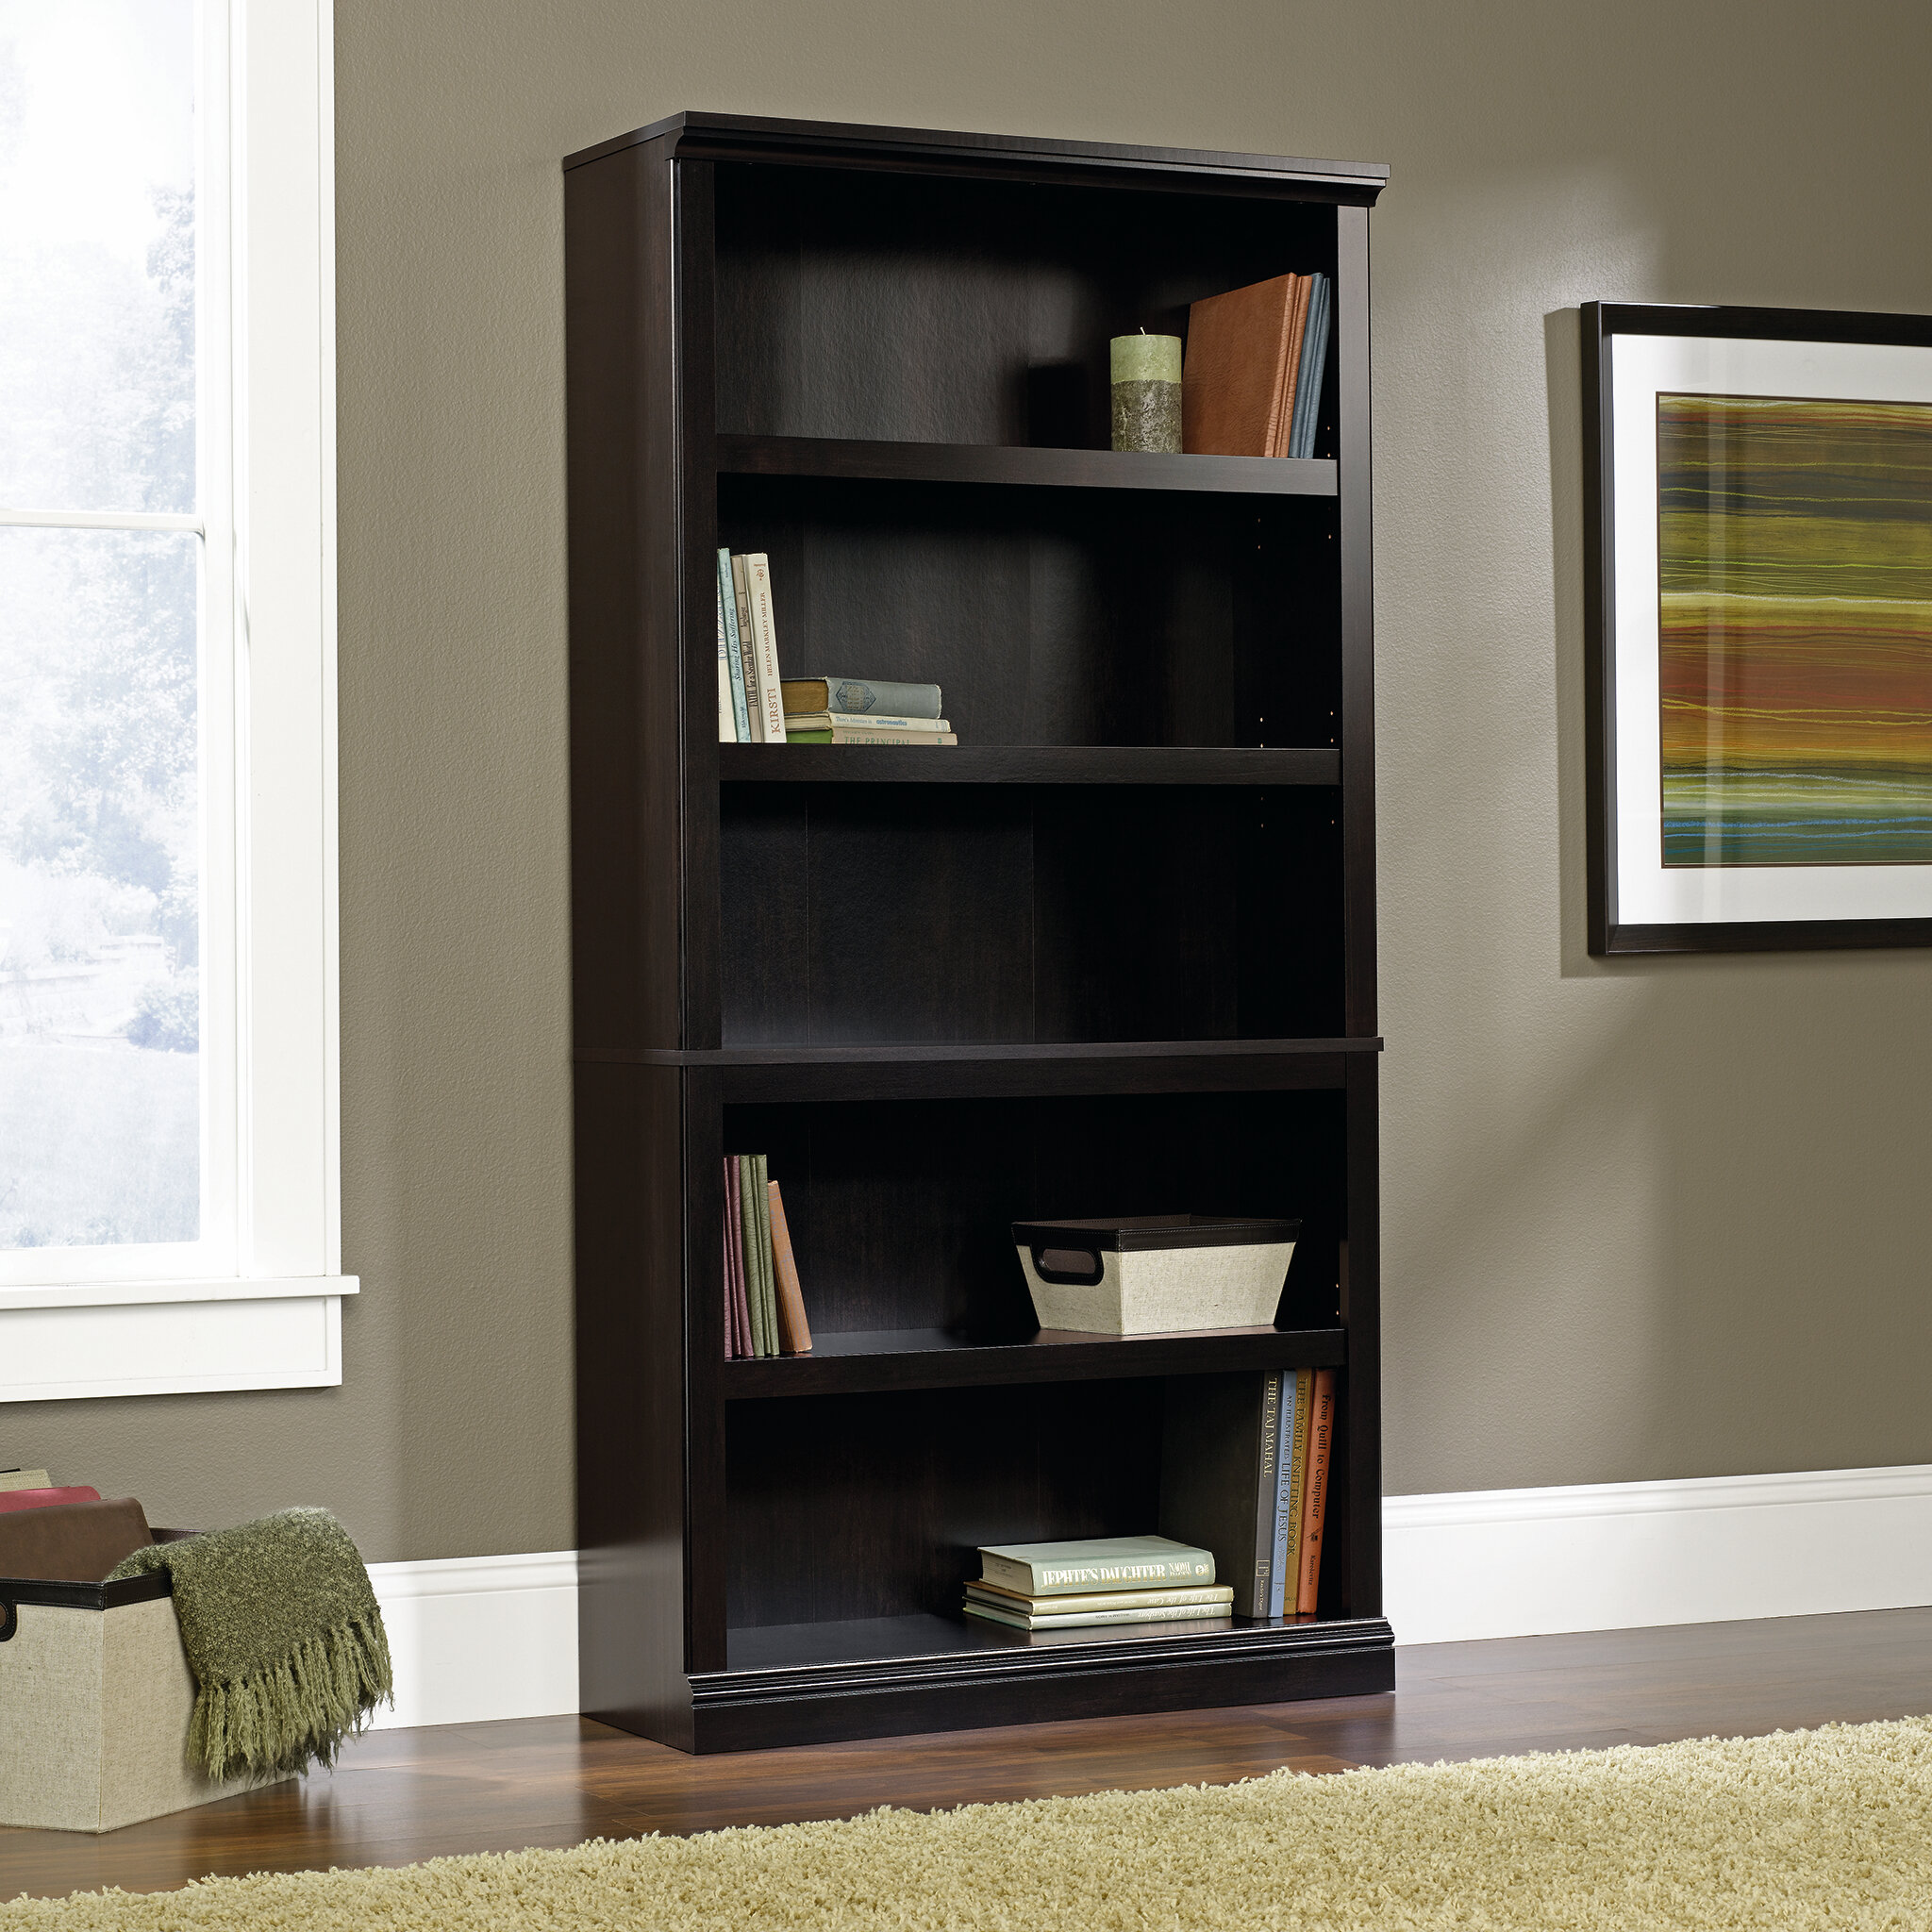 products shelf dining bookcase safco amazon wide baby dp oak com kitchen medium